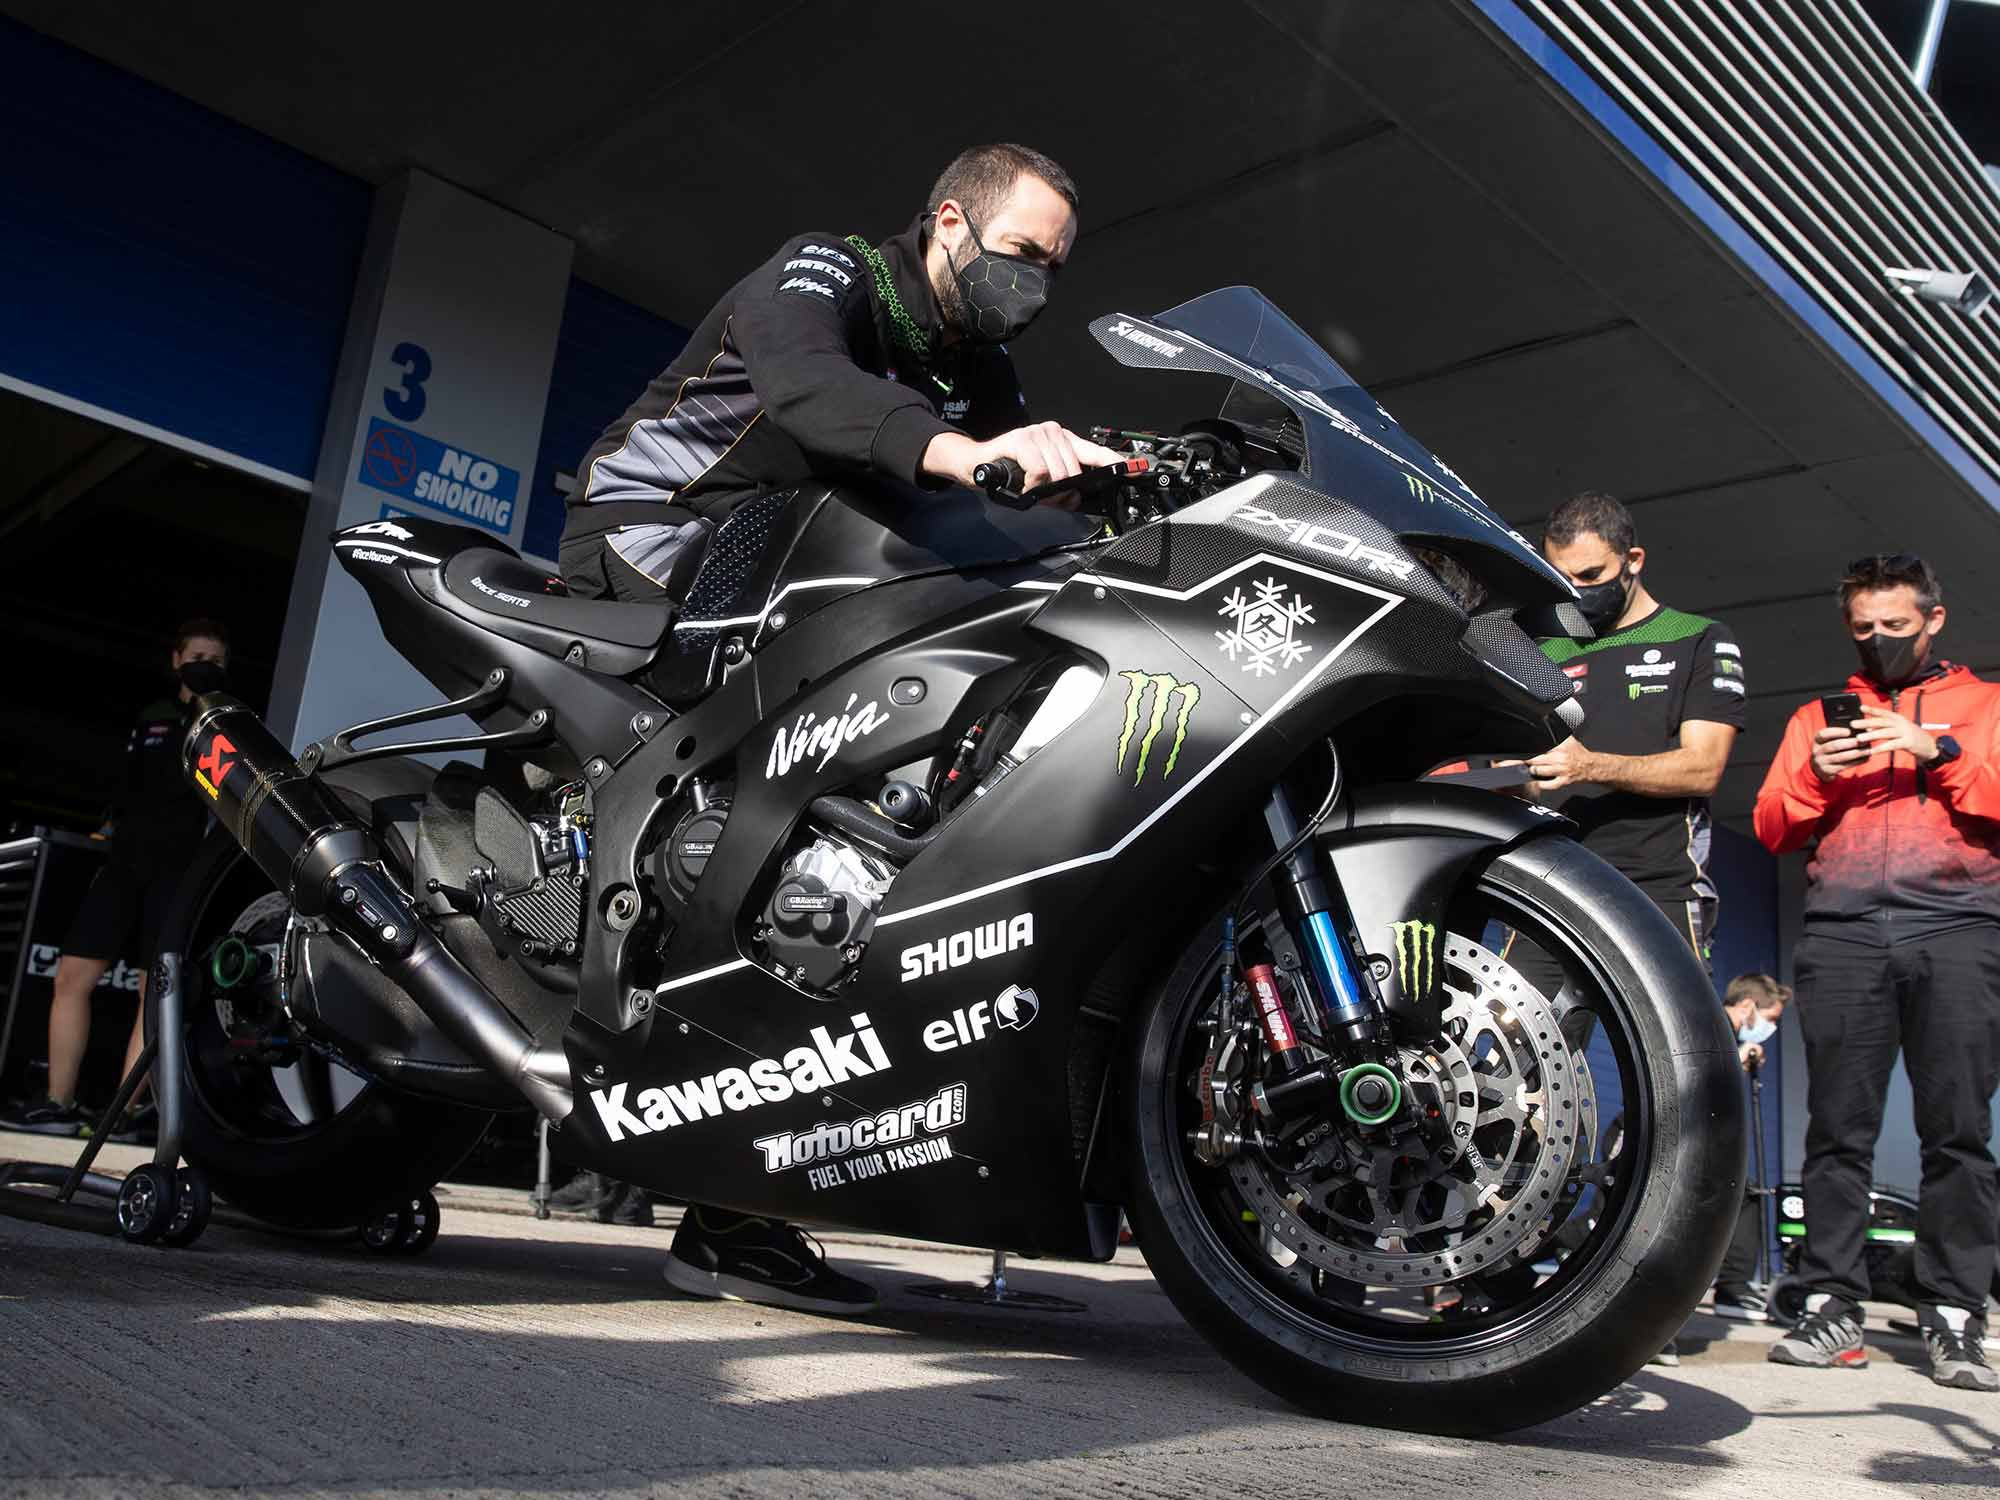 2021 Kawasaki Ninja Zx 10r And Zx 10rr Leaked Cycle World